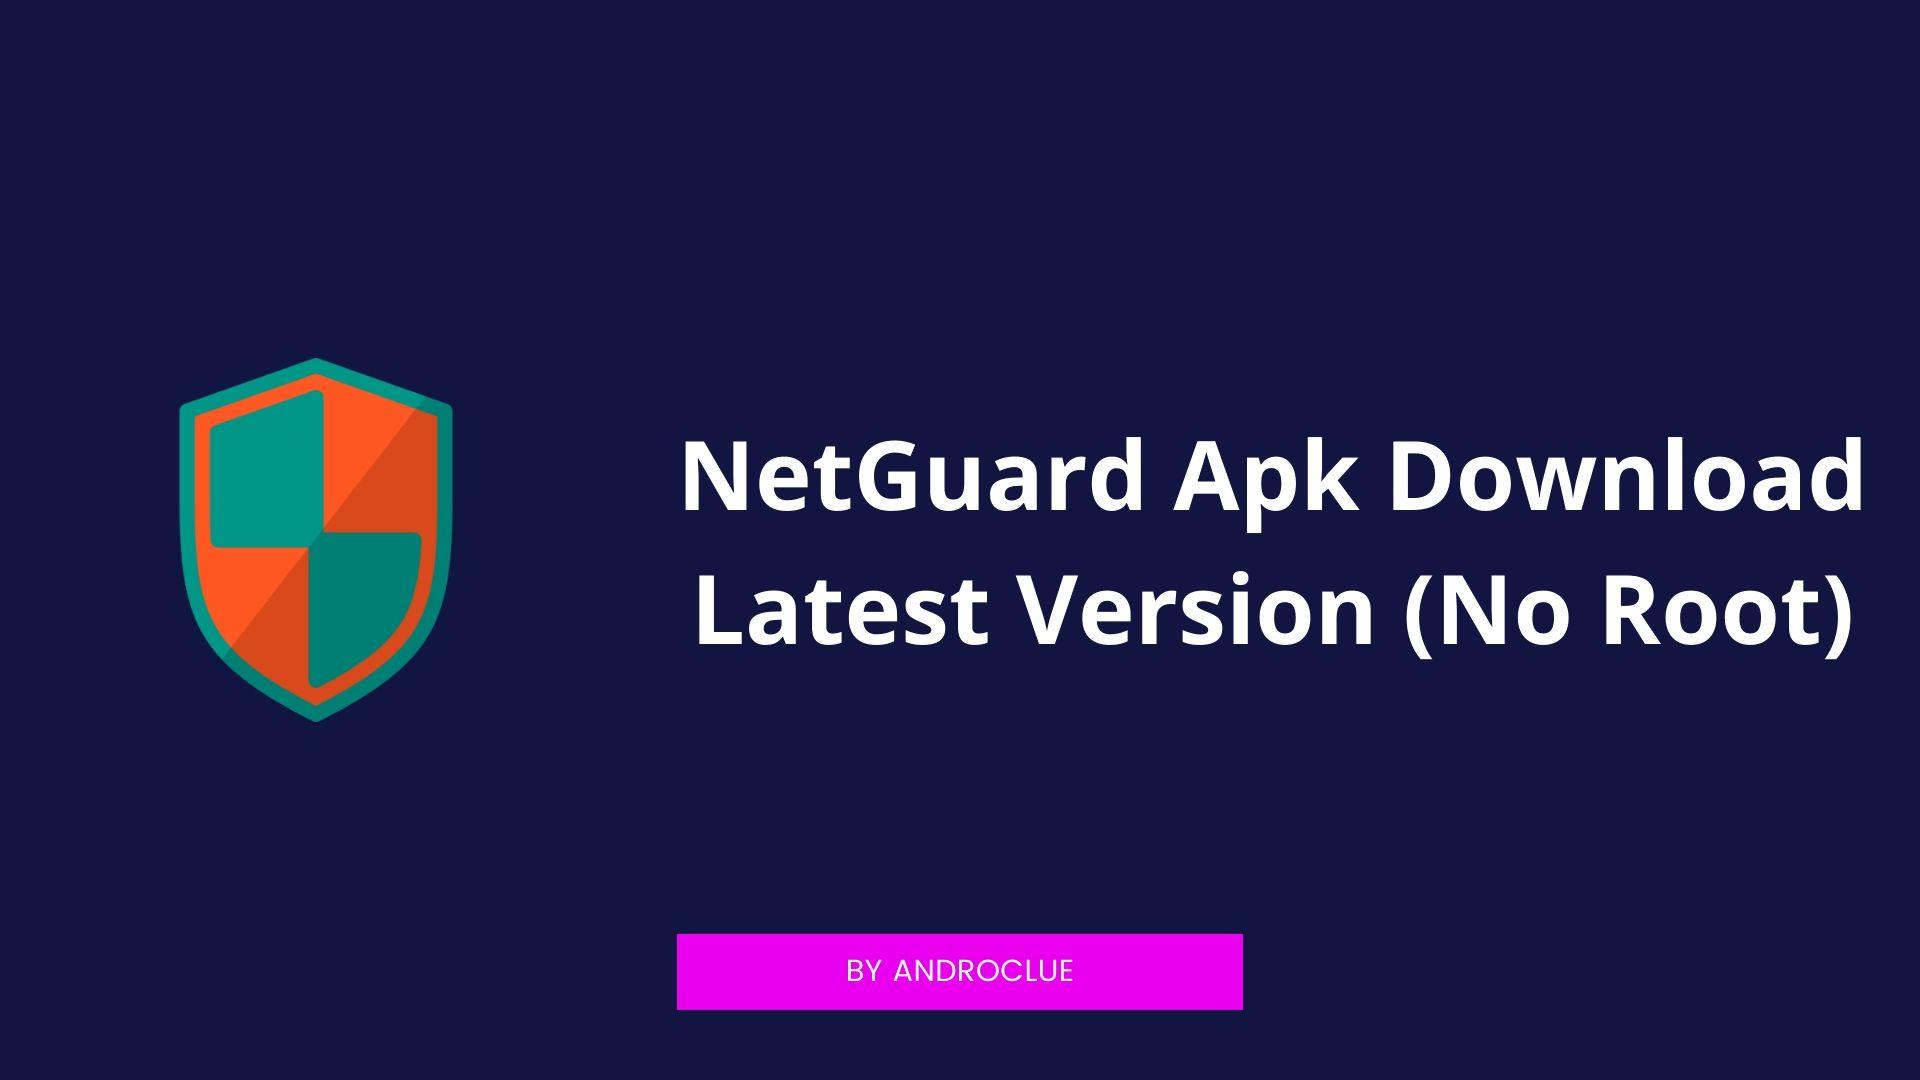 NetGuard Apk Download